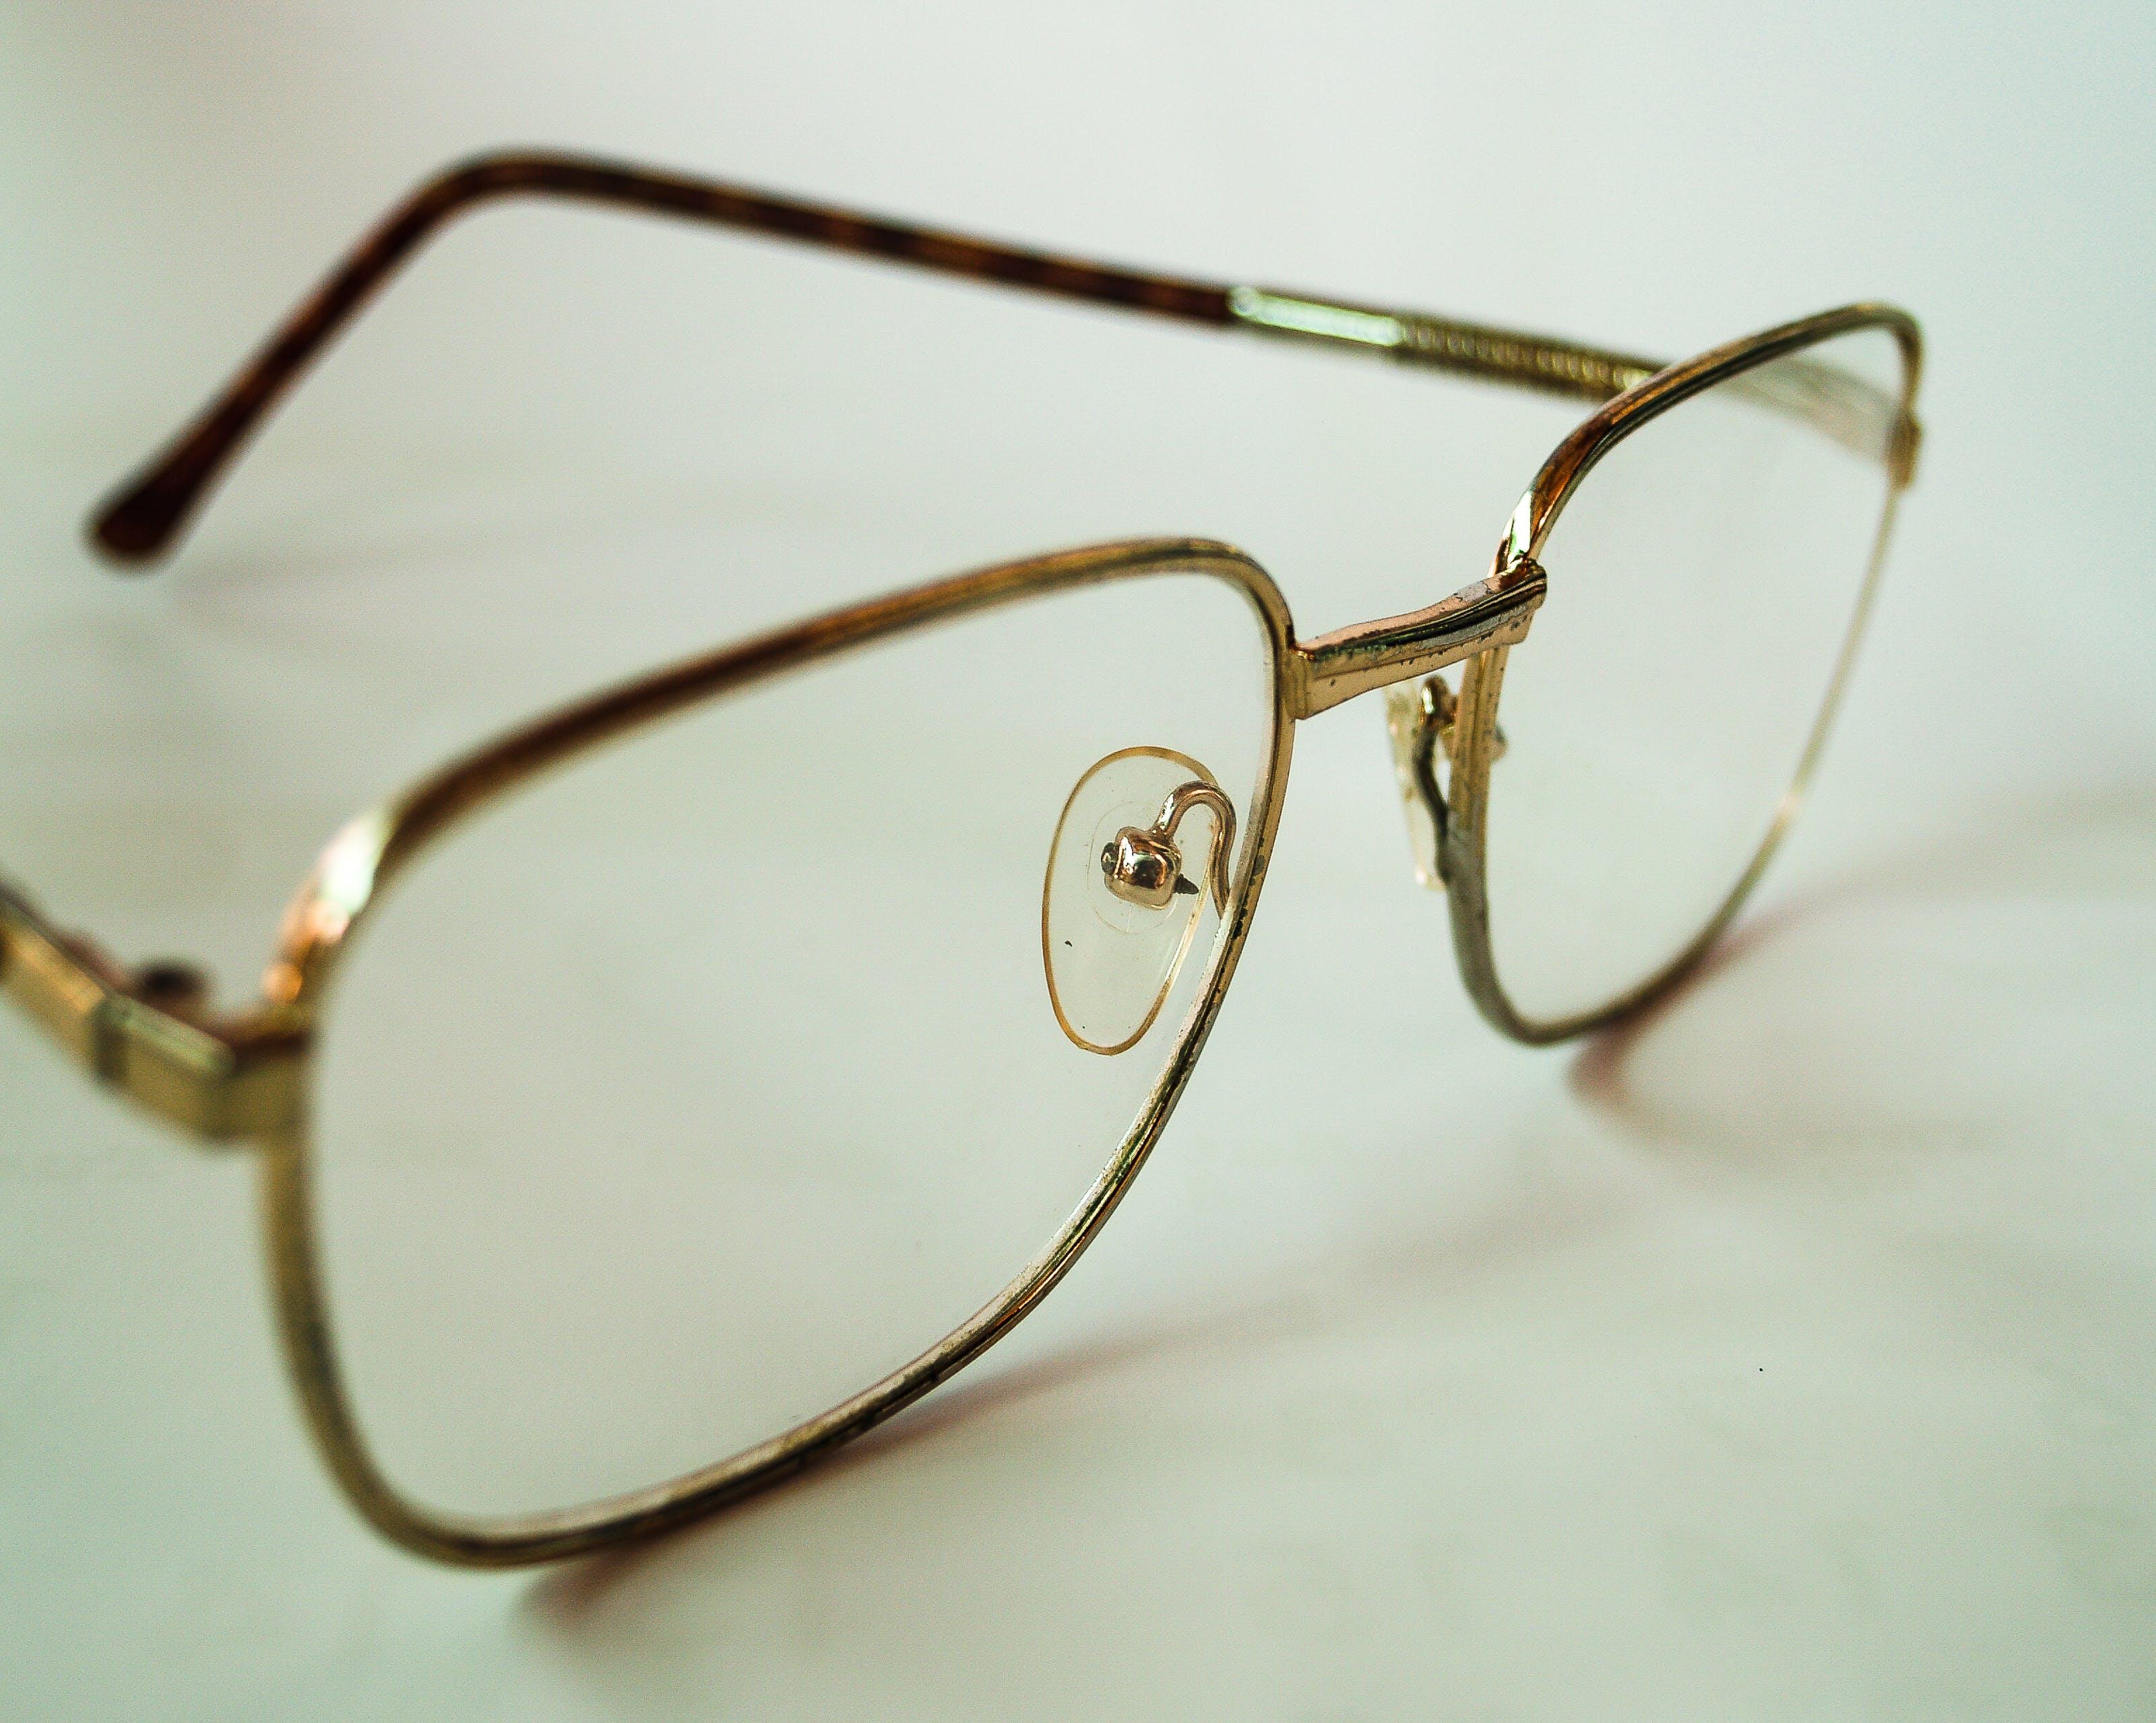 Close-up Photo of Yellow Frame Eyeglasses